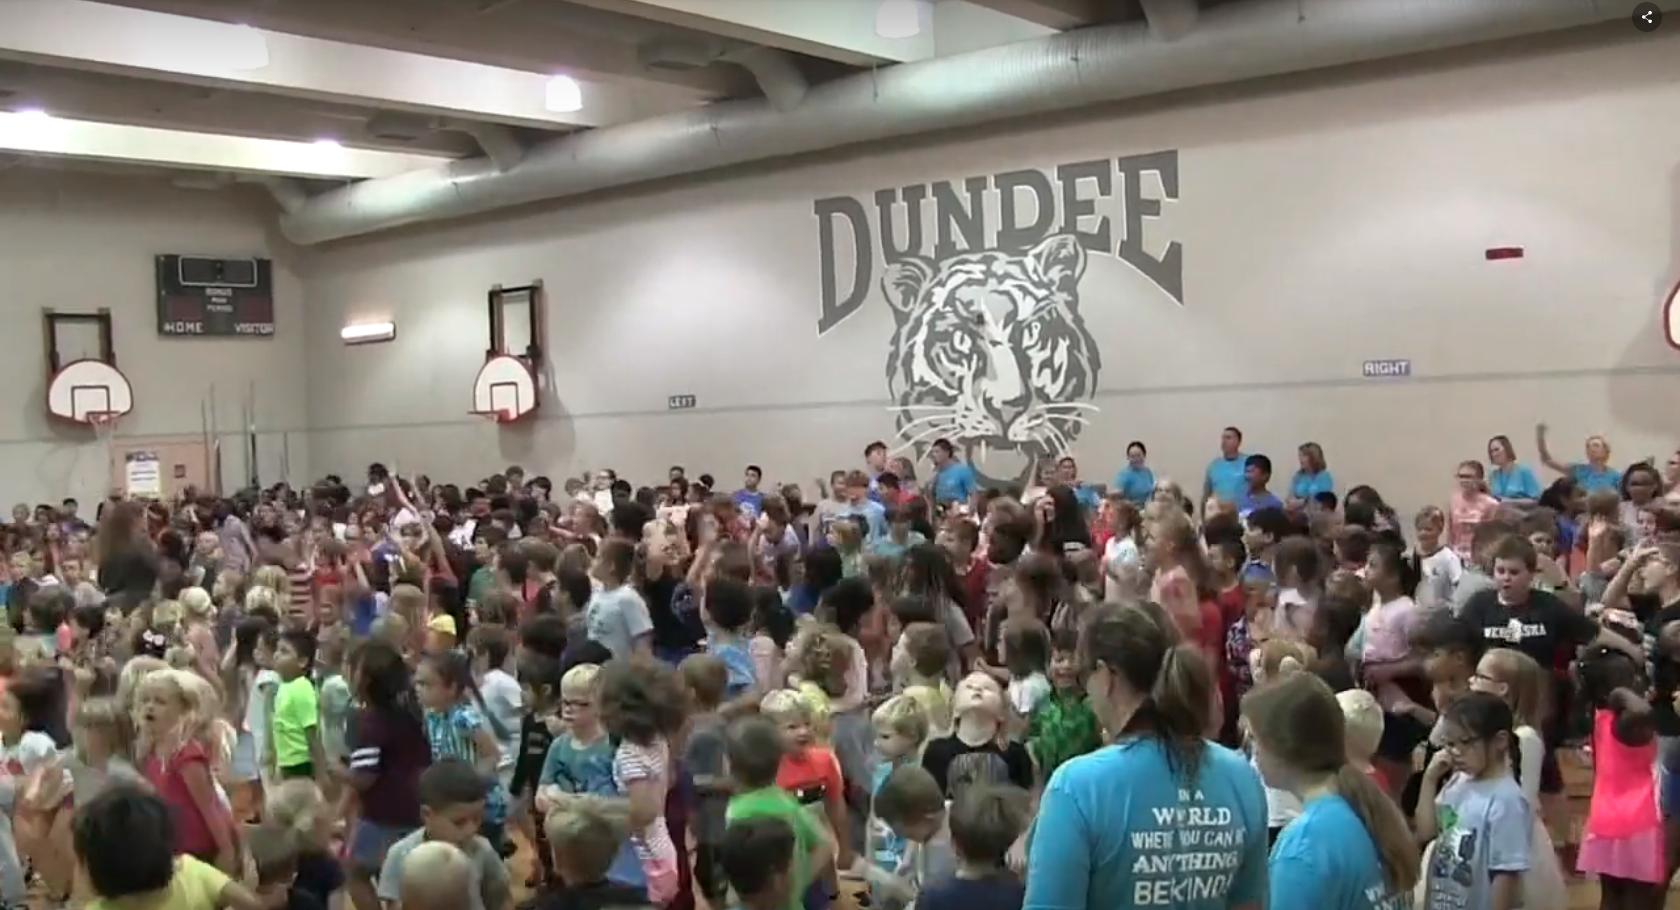 Dundee Elementary School